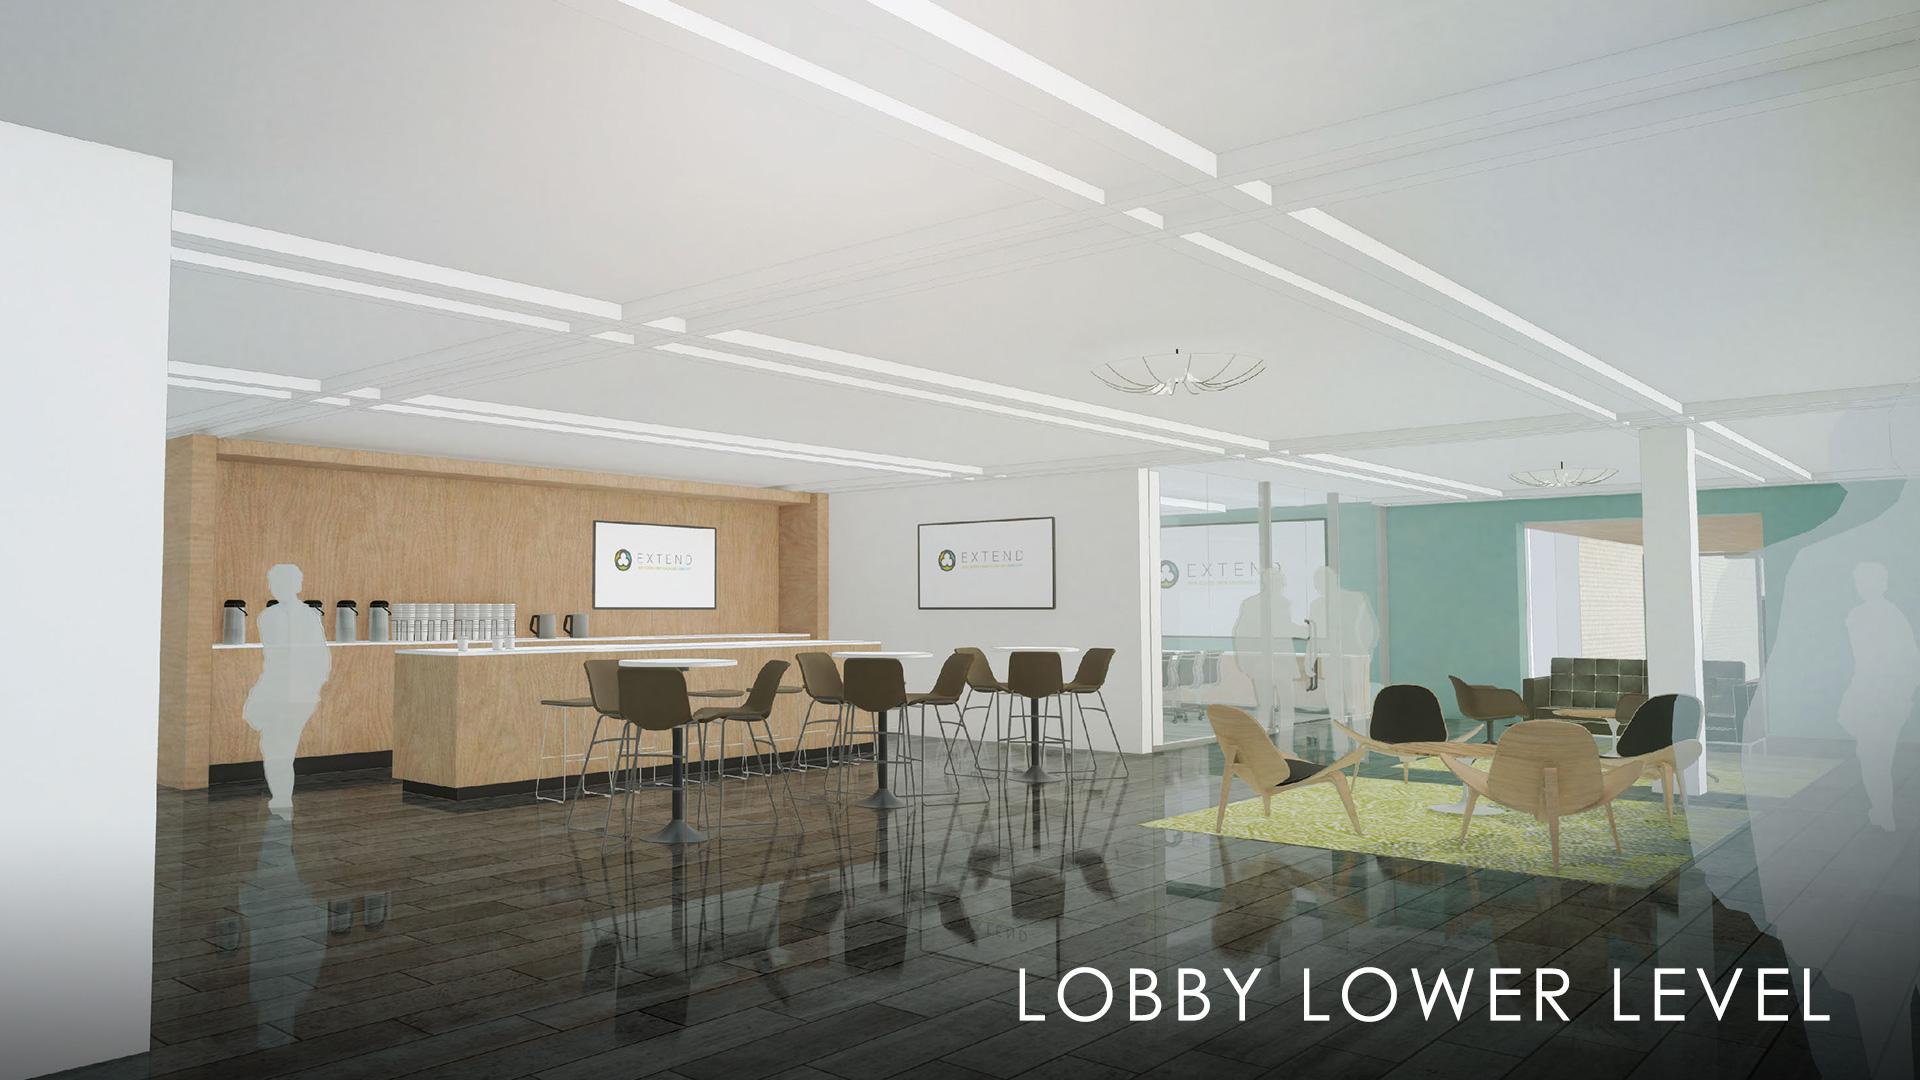 LobbyLowerLevel-1920x1080.jpg